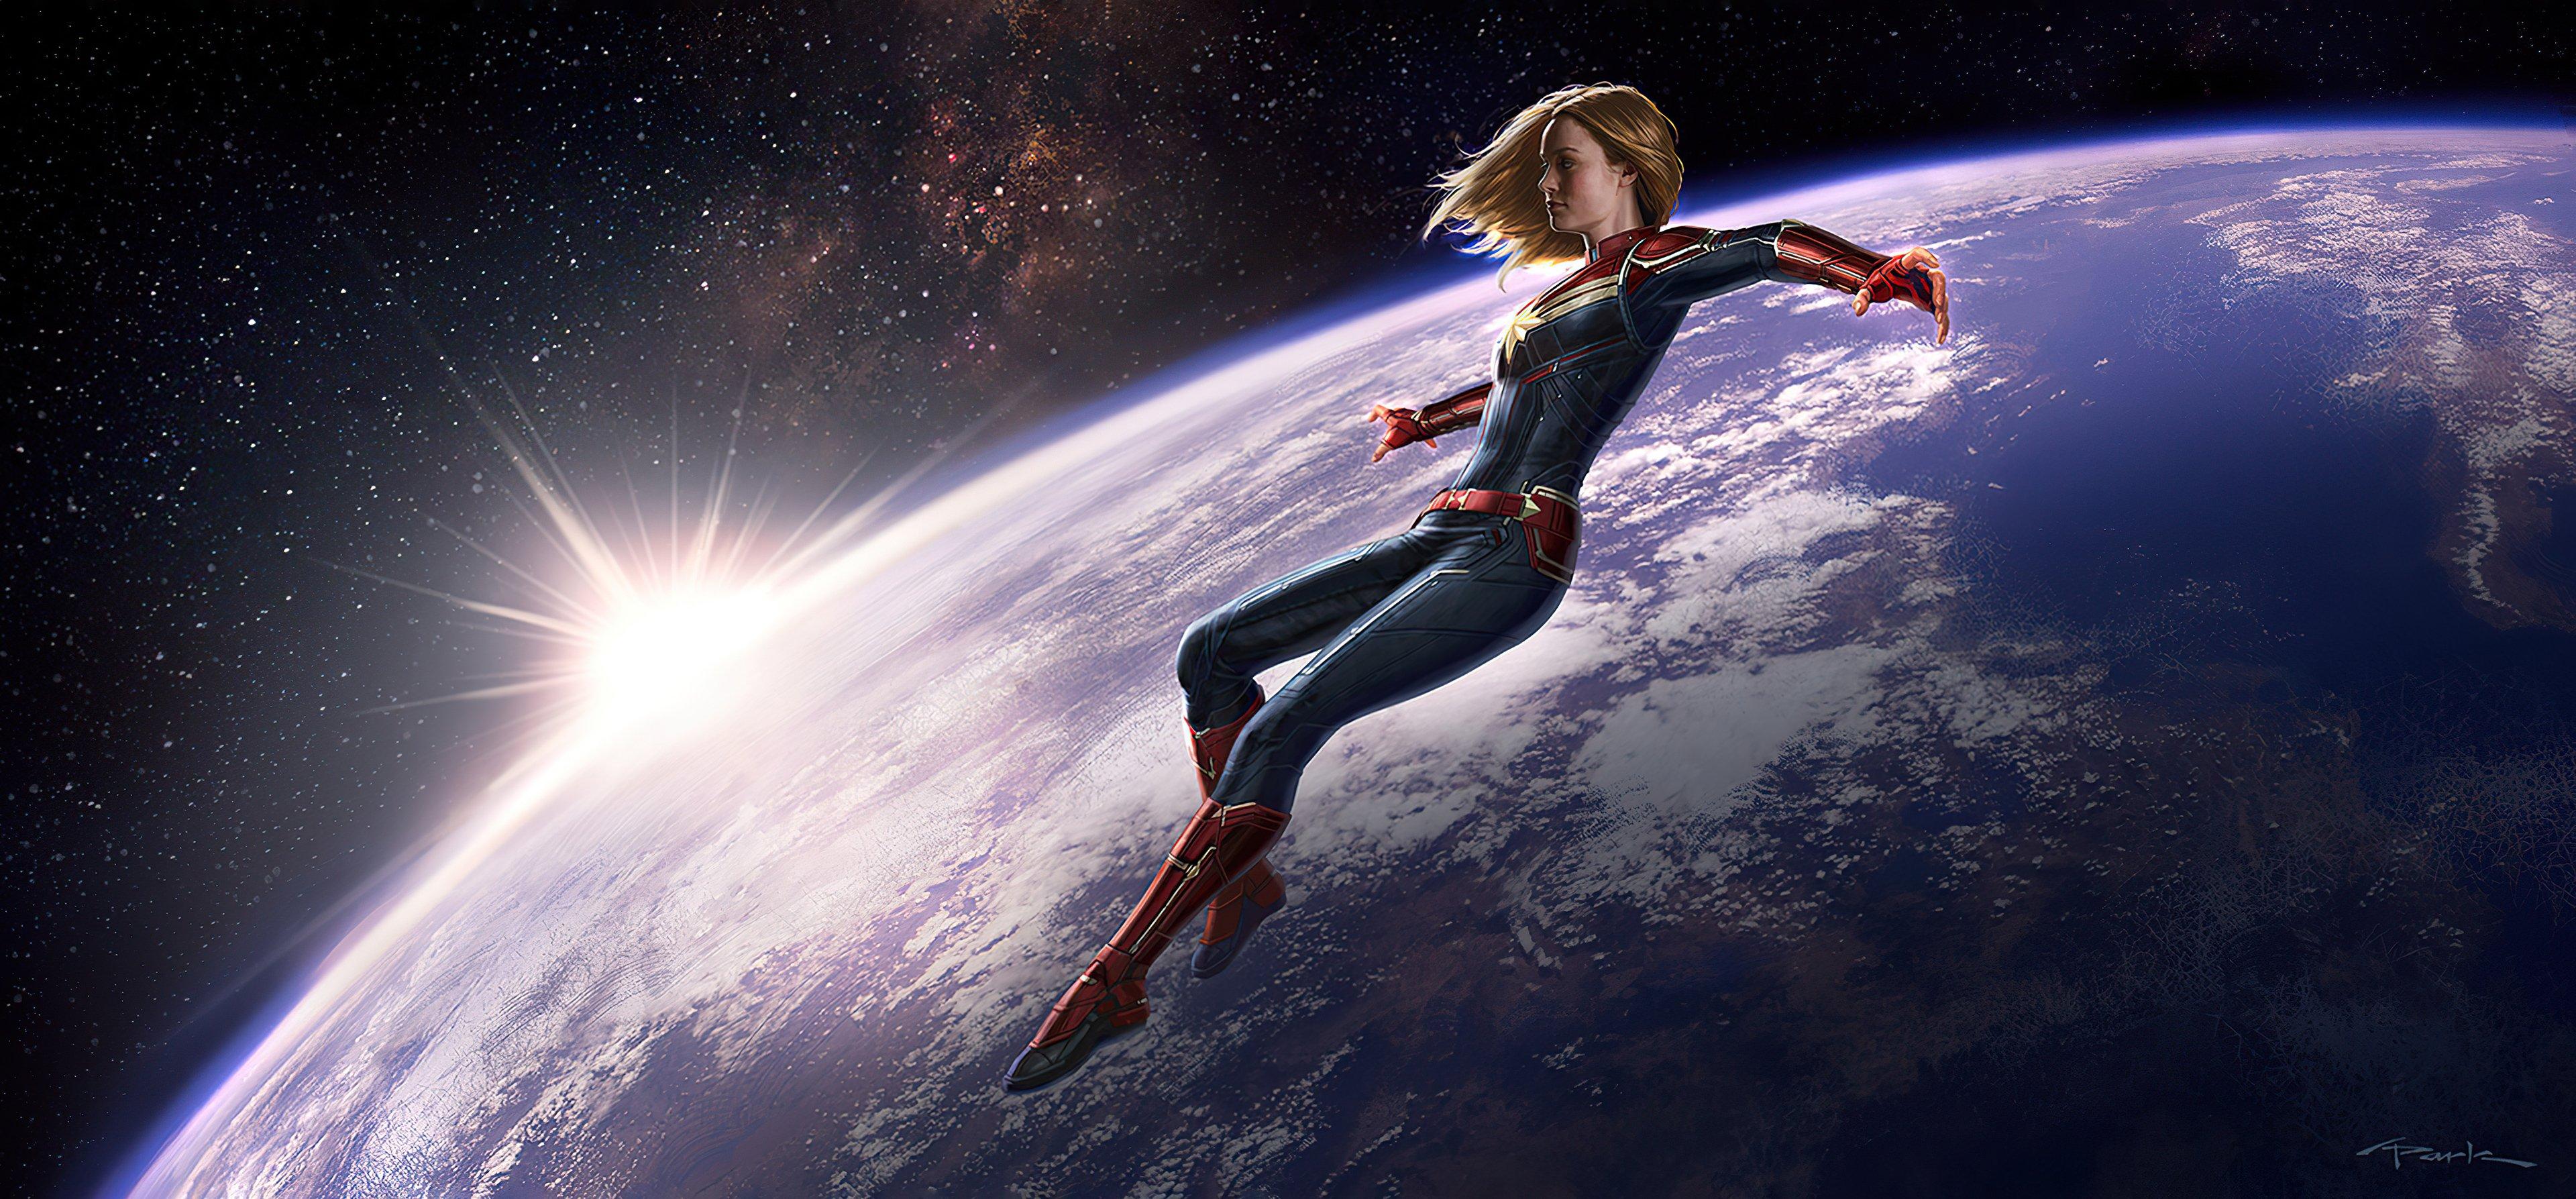 Fondos de pantalla Capitana Marvel fuera de la tierra